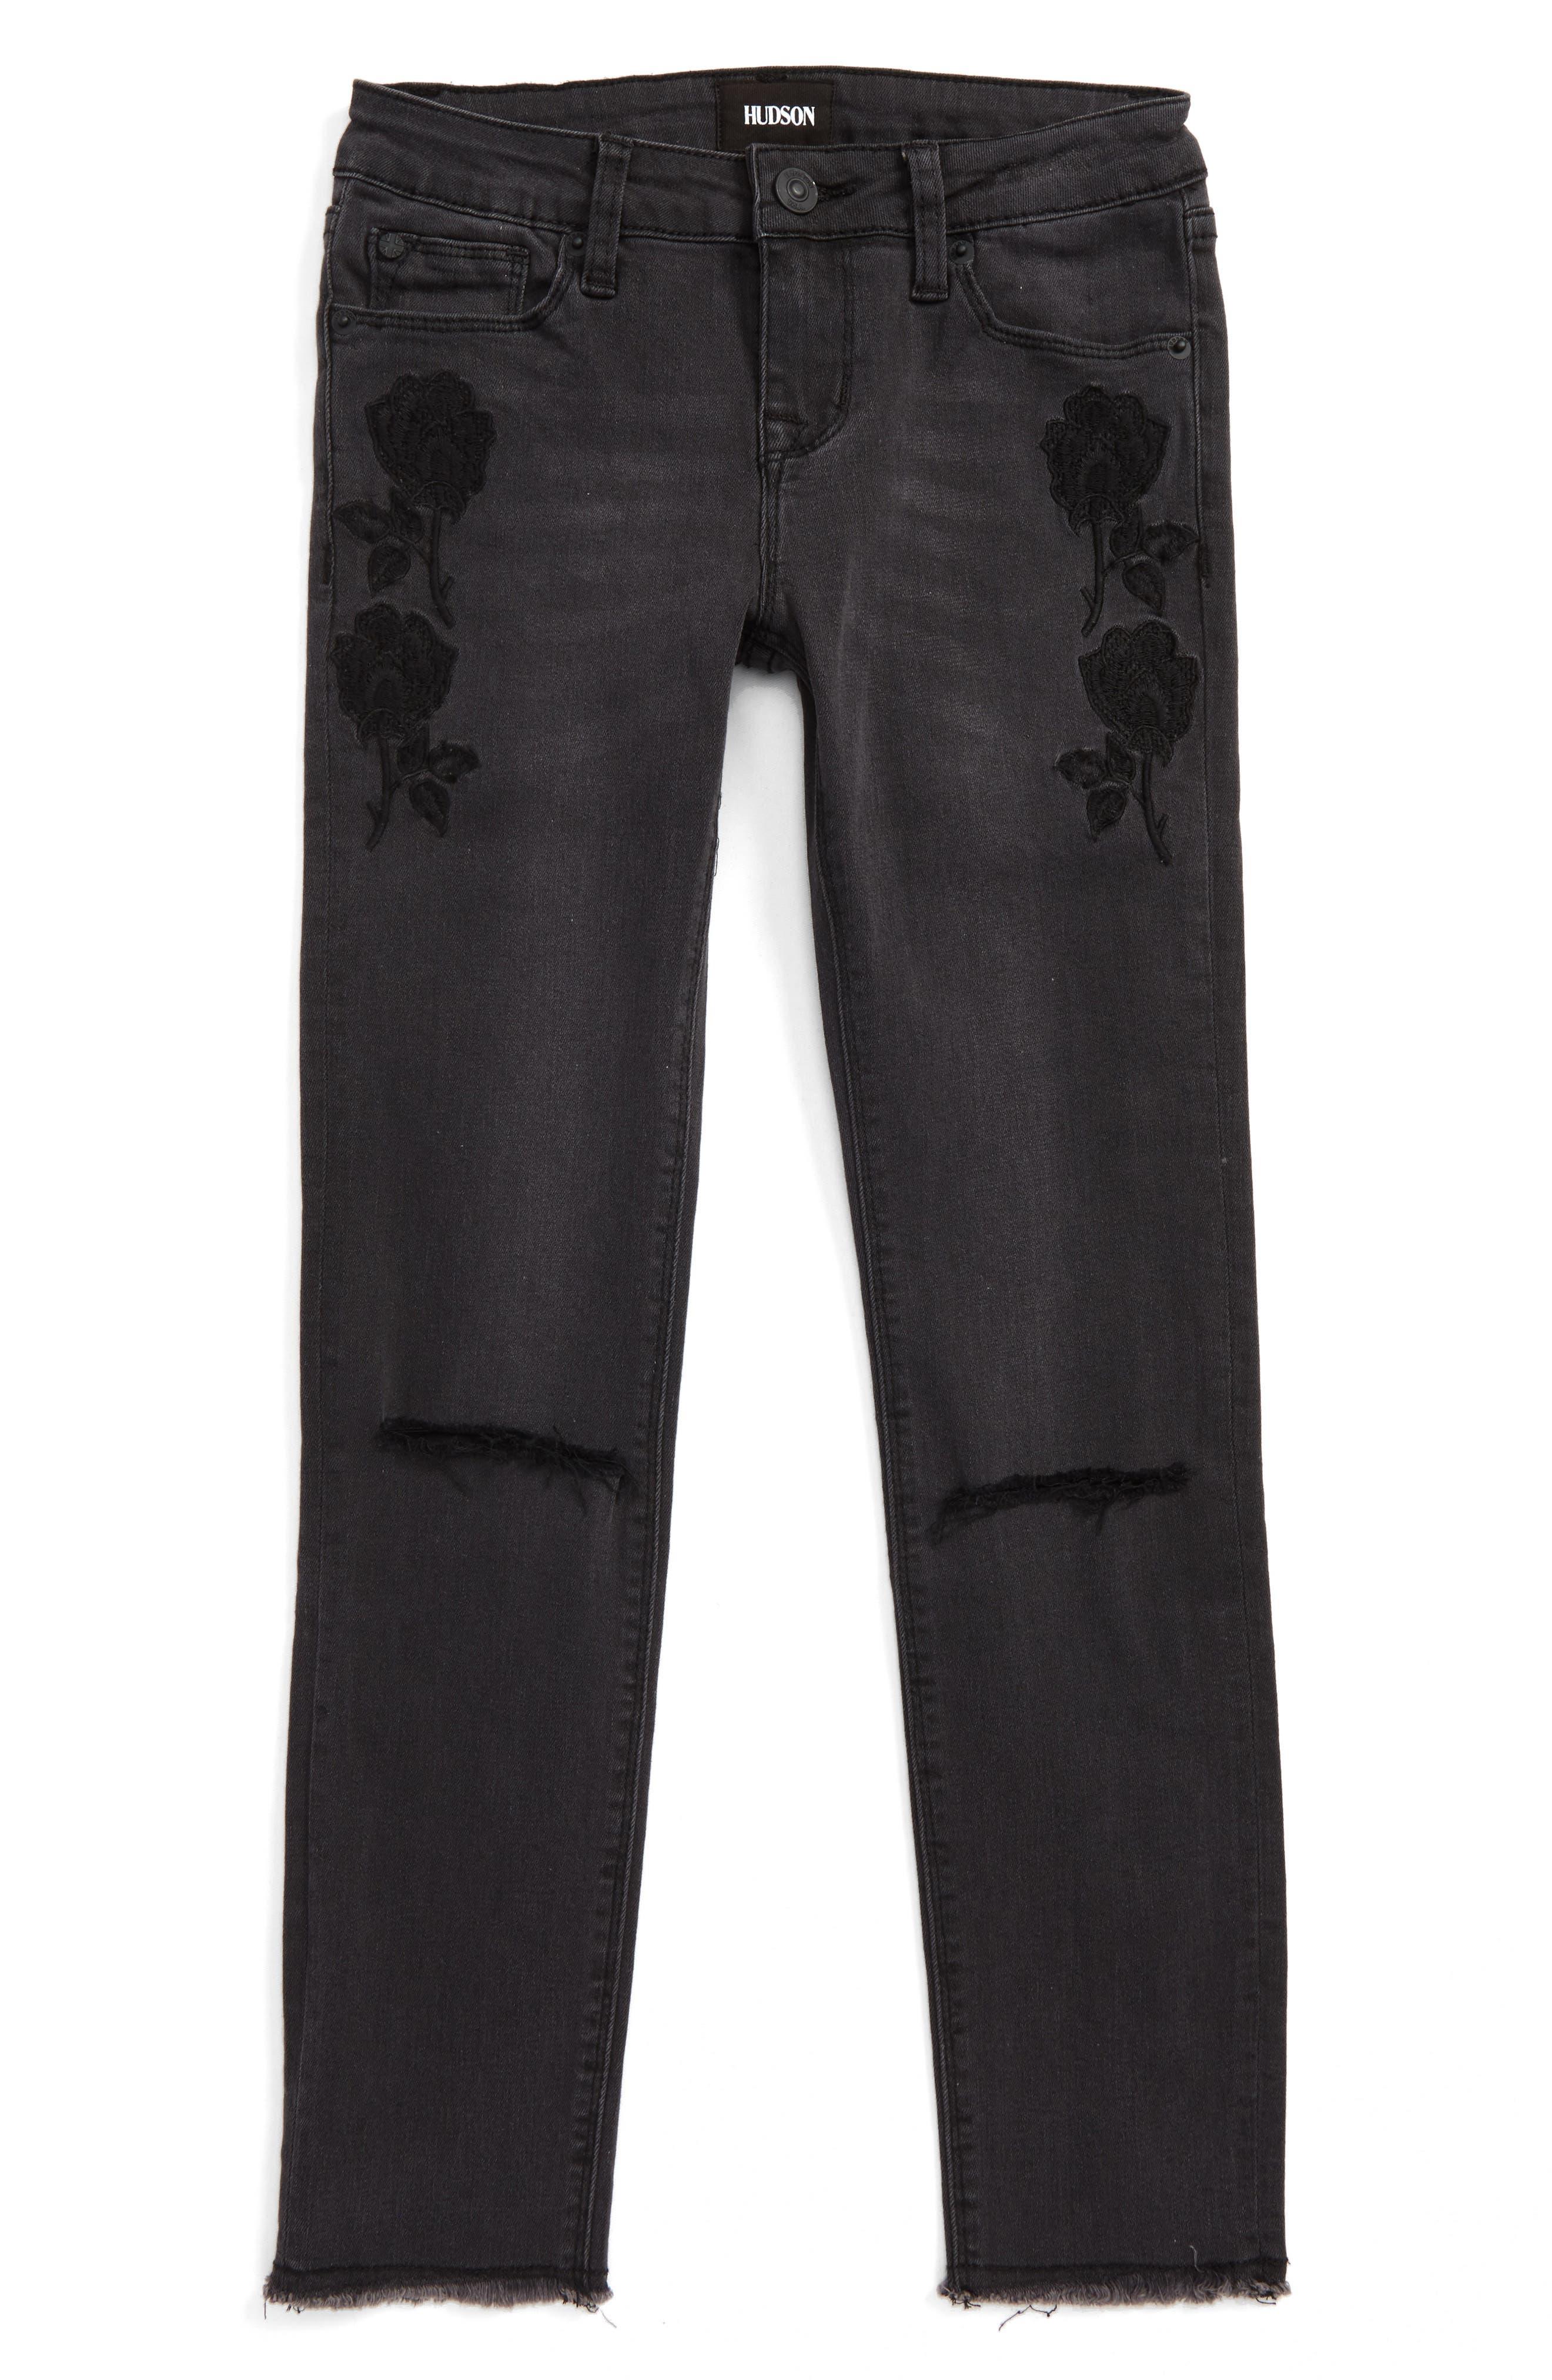 Black Iris Skinny Jeans,                             Main thumbnail 1, color,                             008